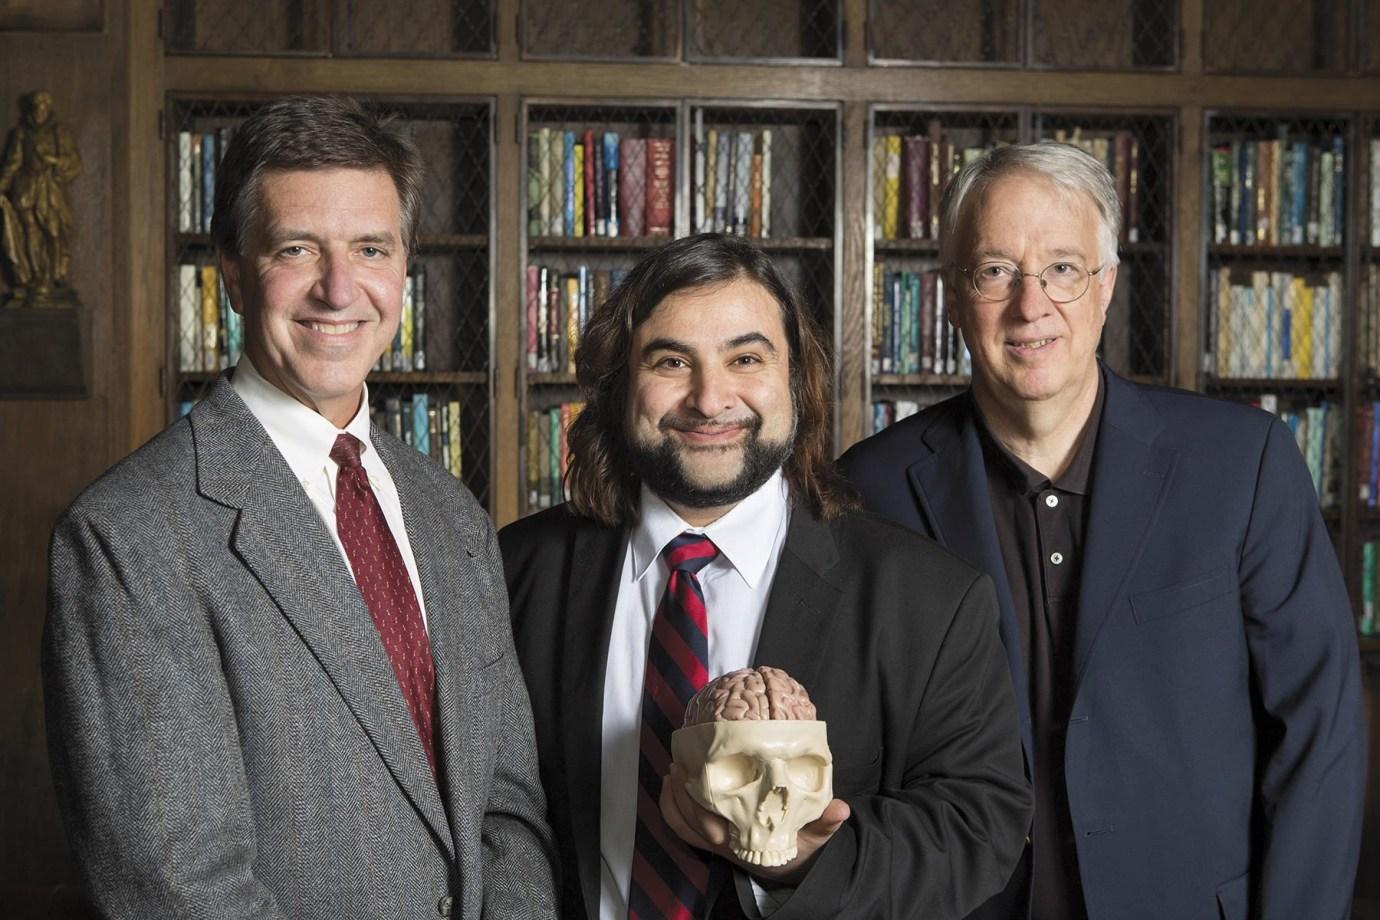 Stephen M. Strittmatter, Arash Salardini, and Chris van Dyck are leading the new Alzheimer's Disease Research Center.